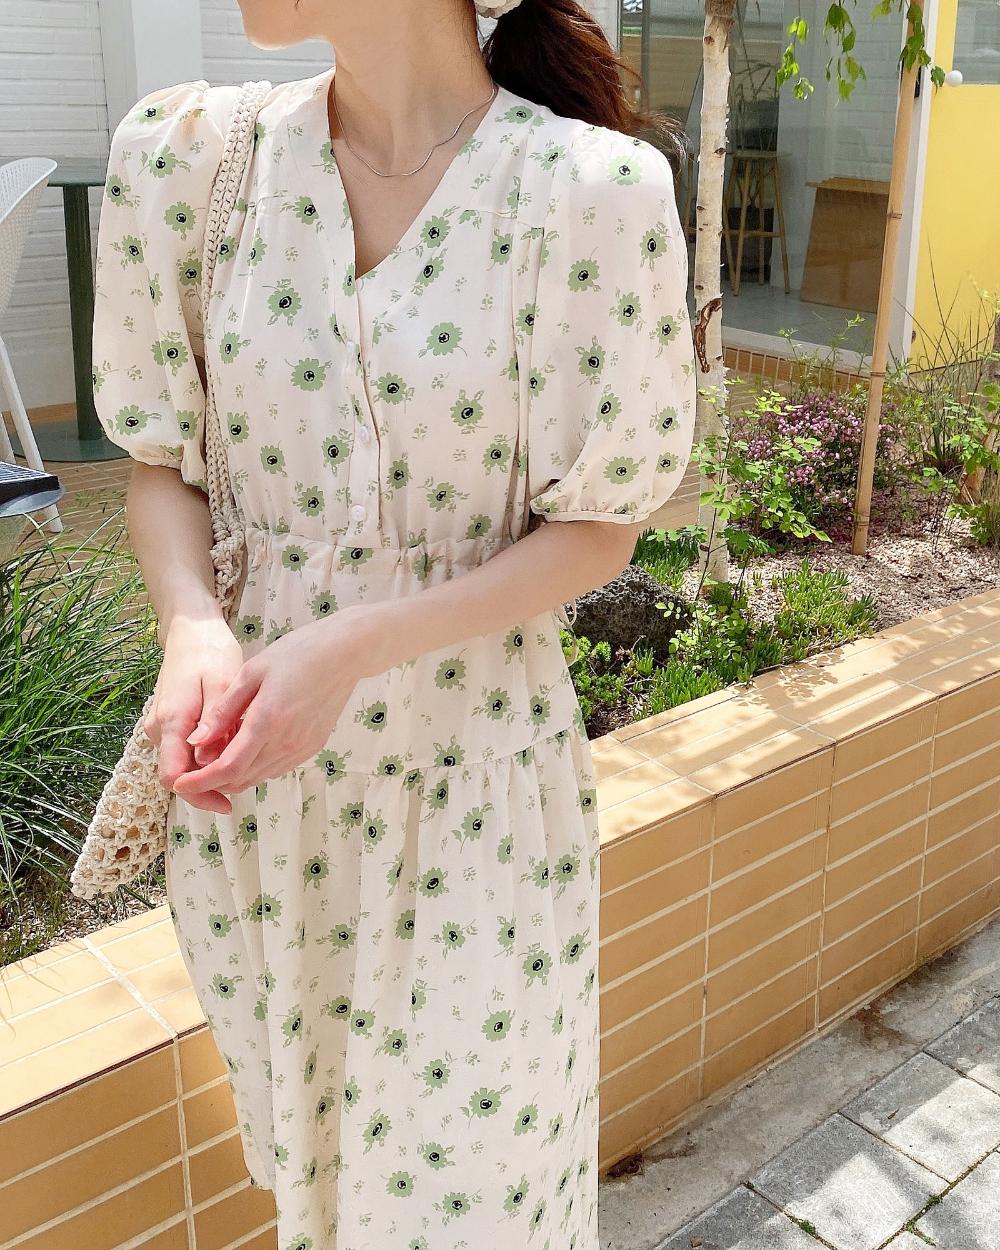 Basering Dress